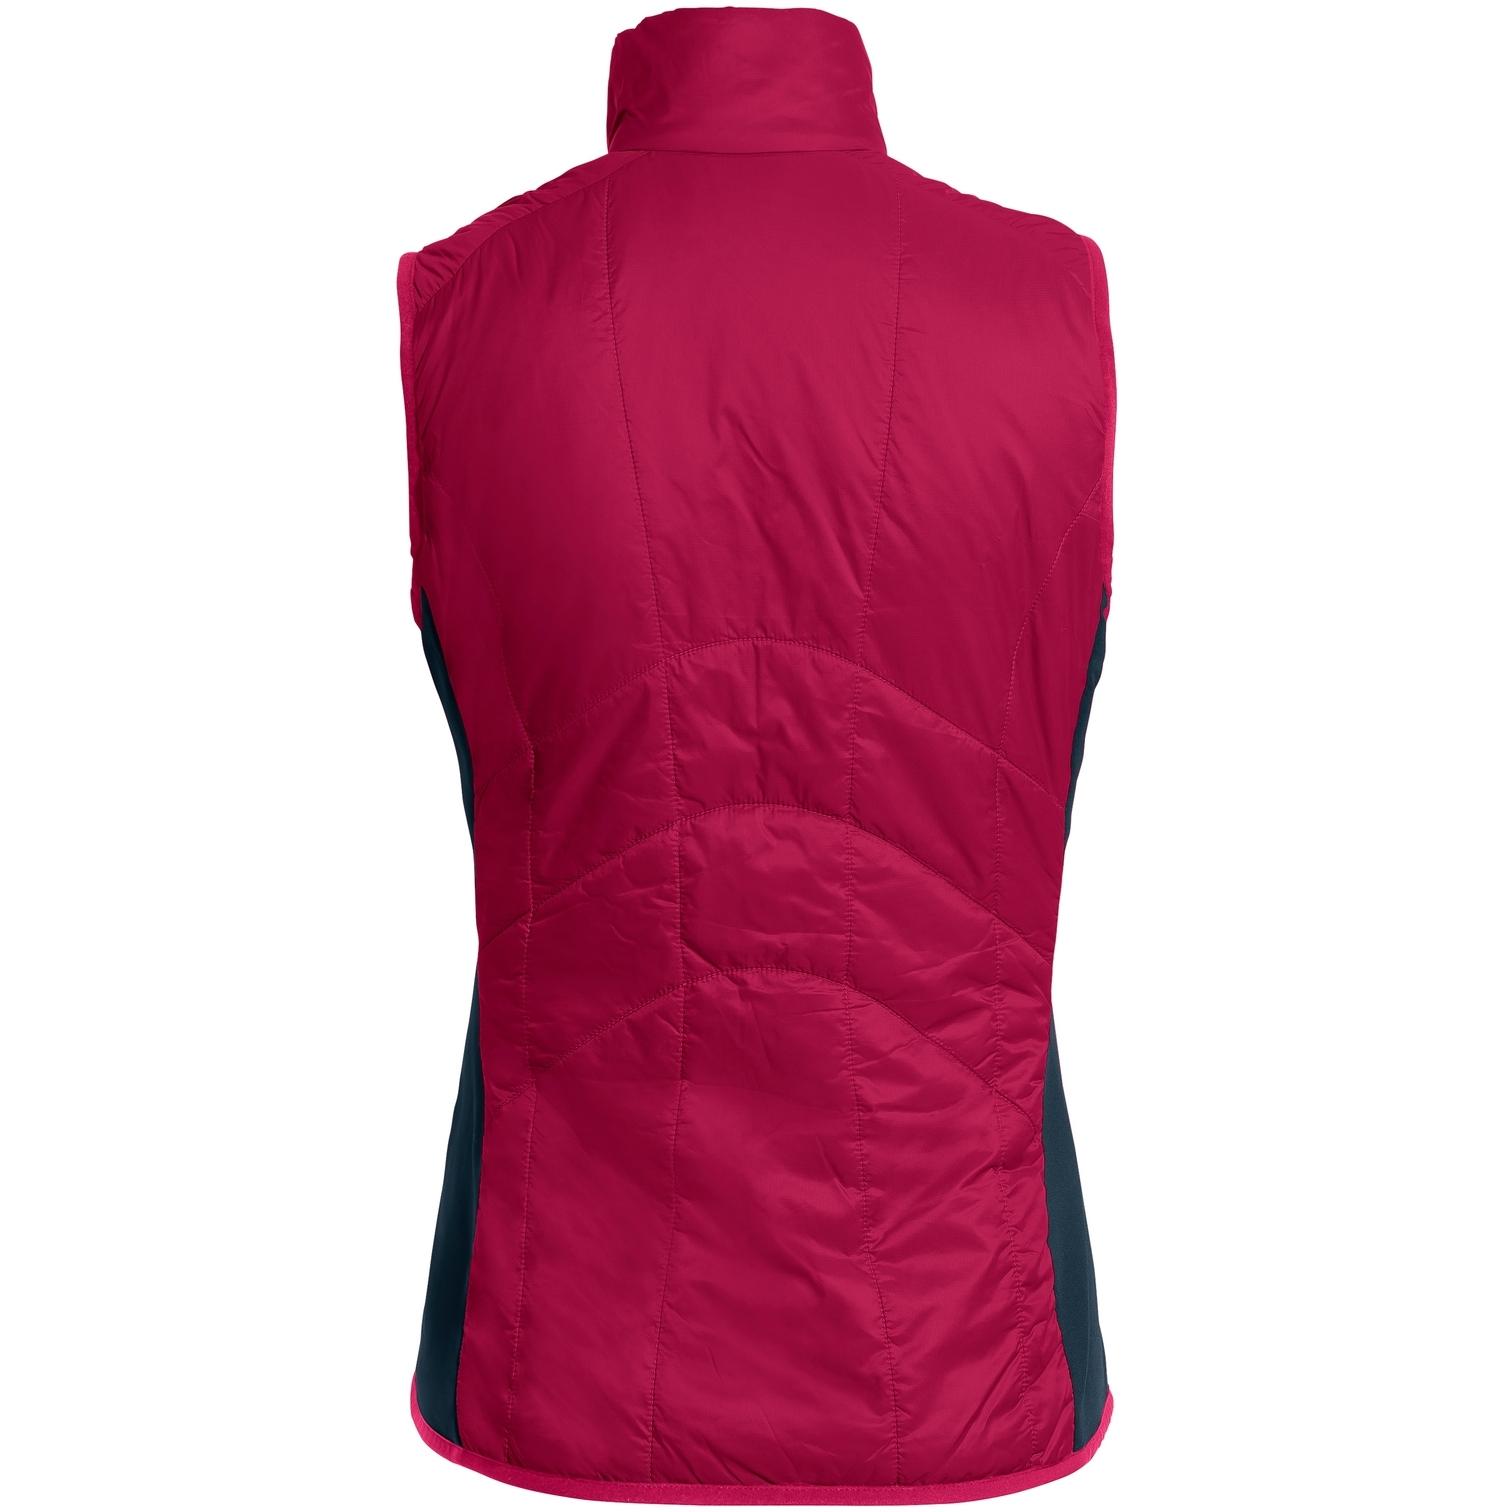 Image of Vaude Women's Sesvenna Vest III - crimson red